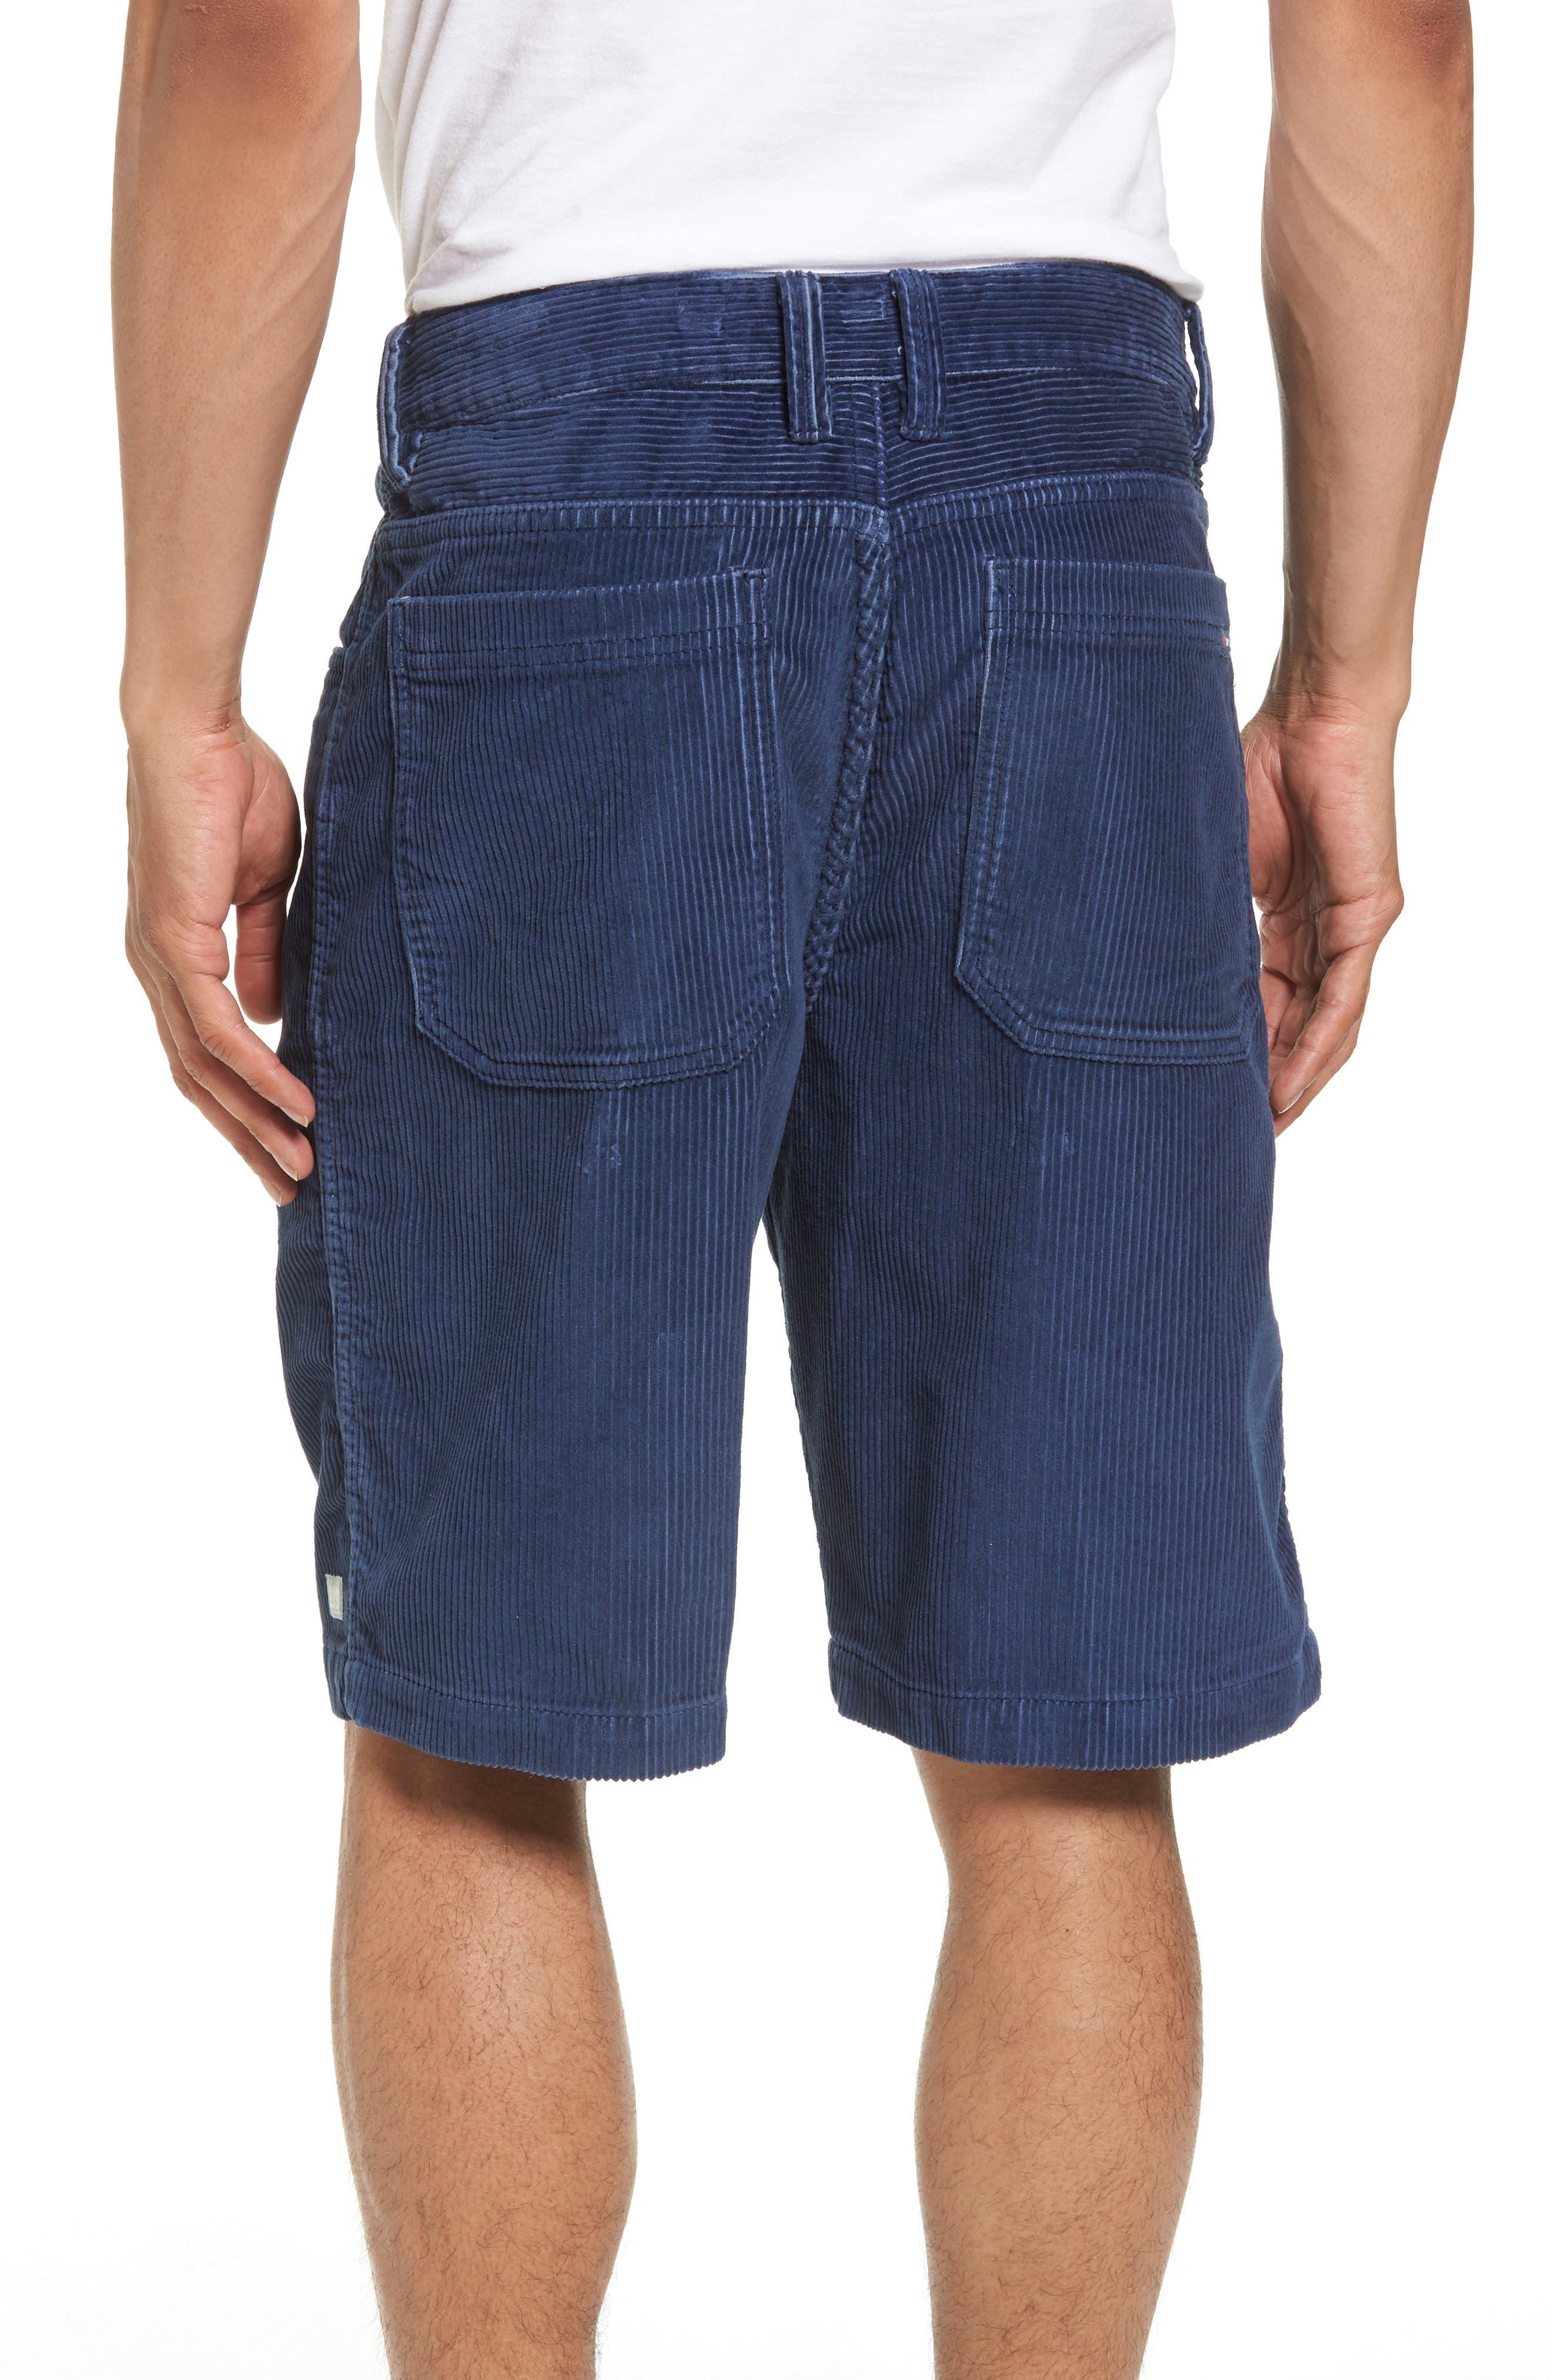 Kordo Corduroy Walking Shorts,                             Alternate thumbnail 5, color,